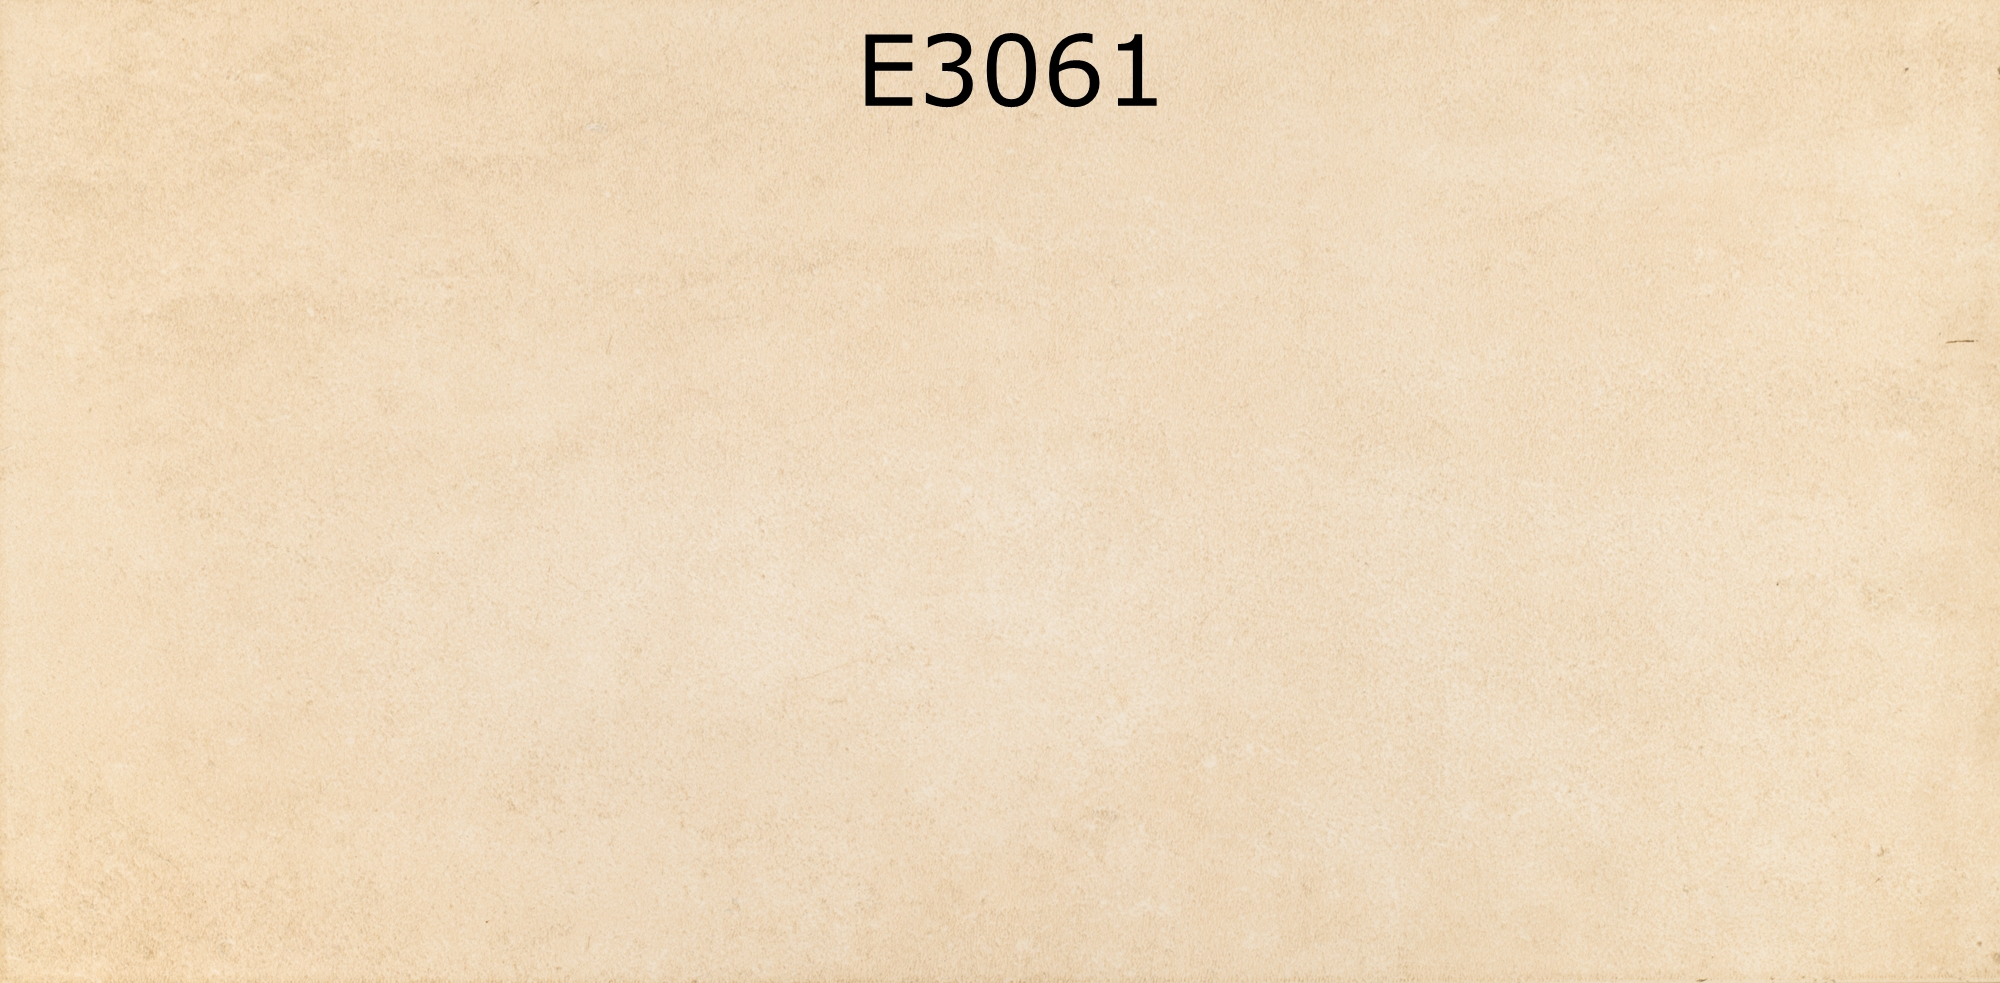 E3061